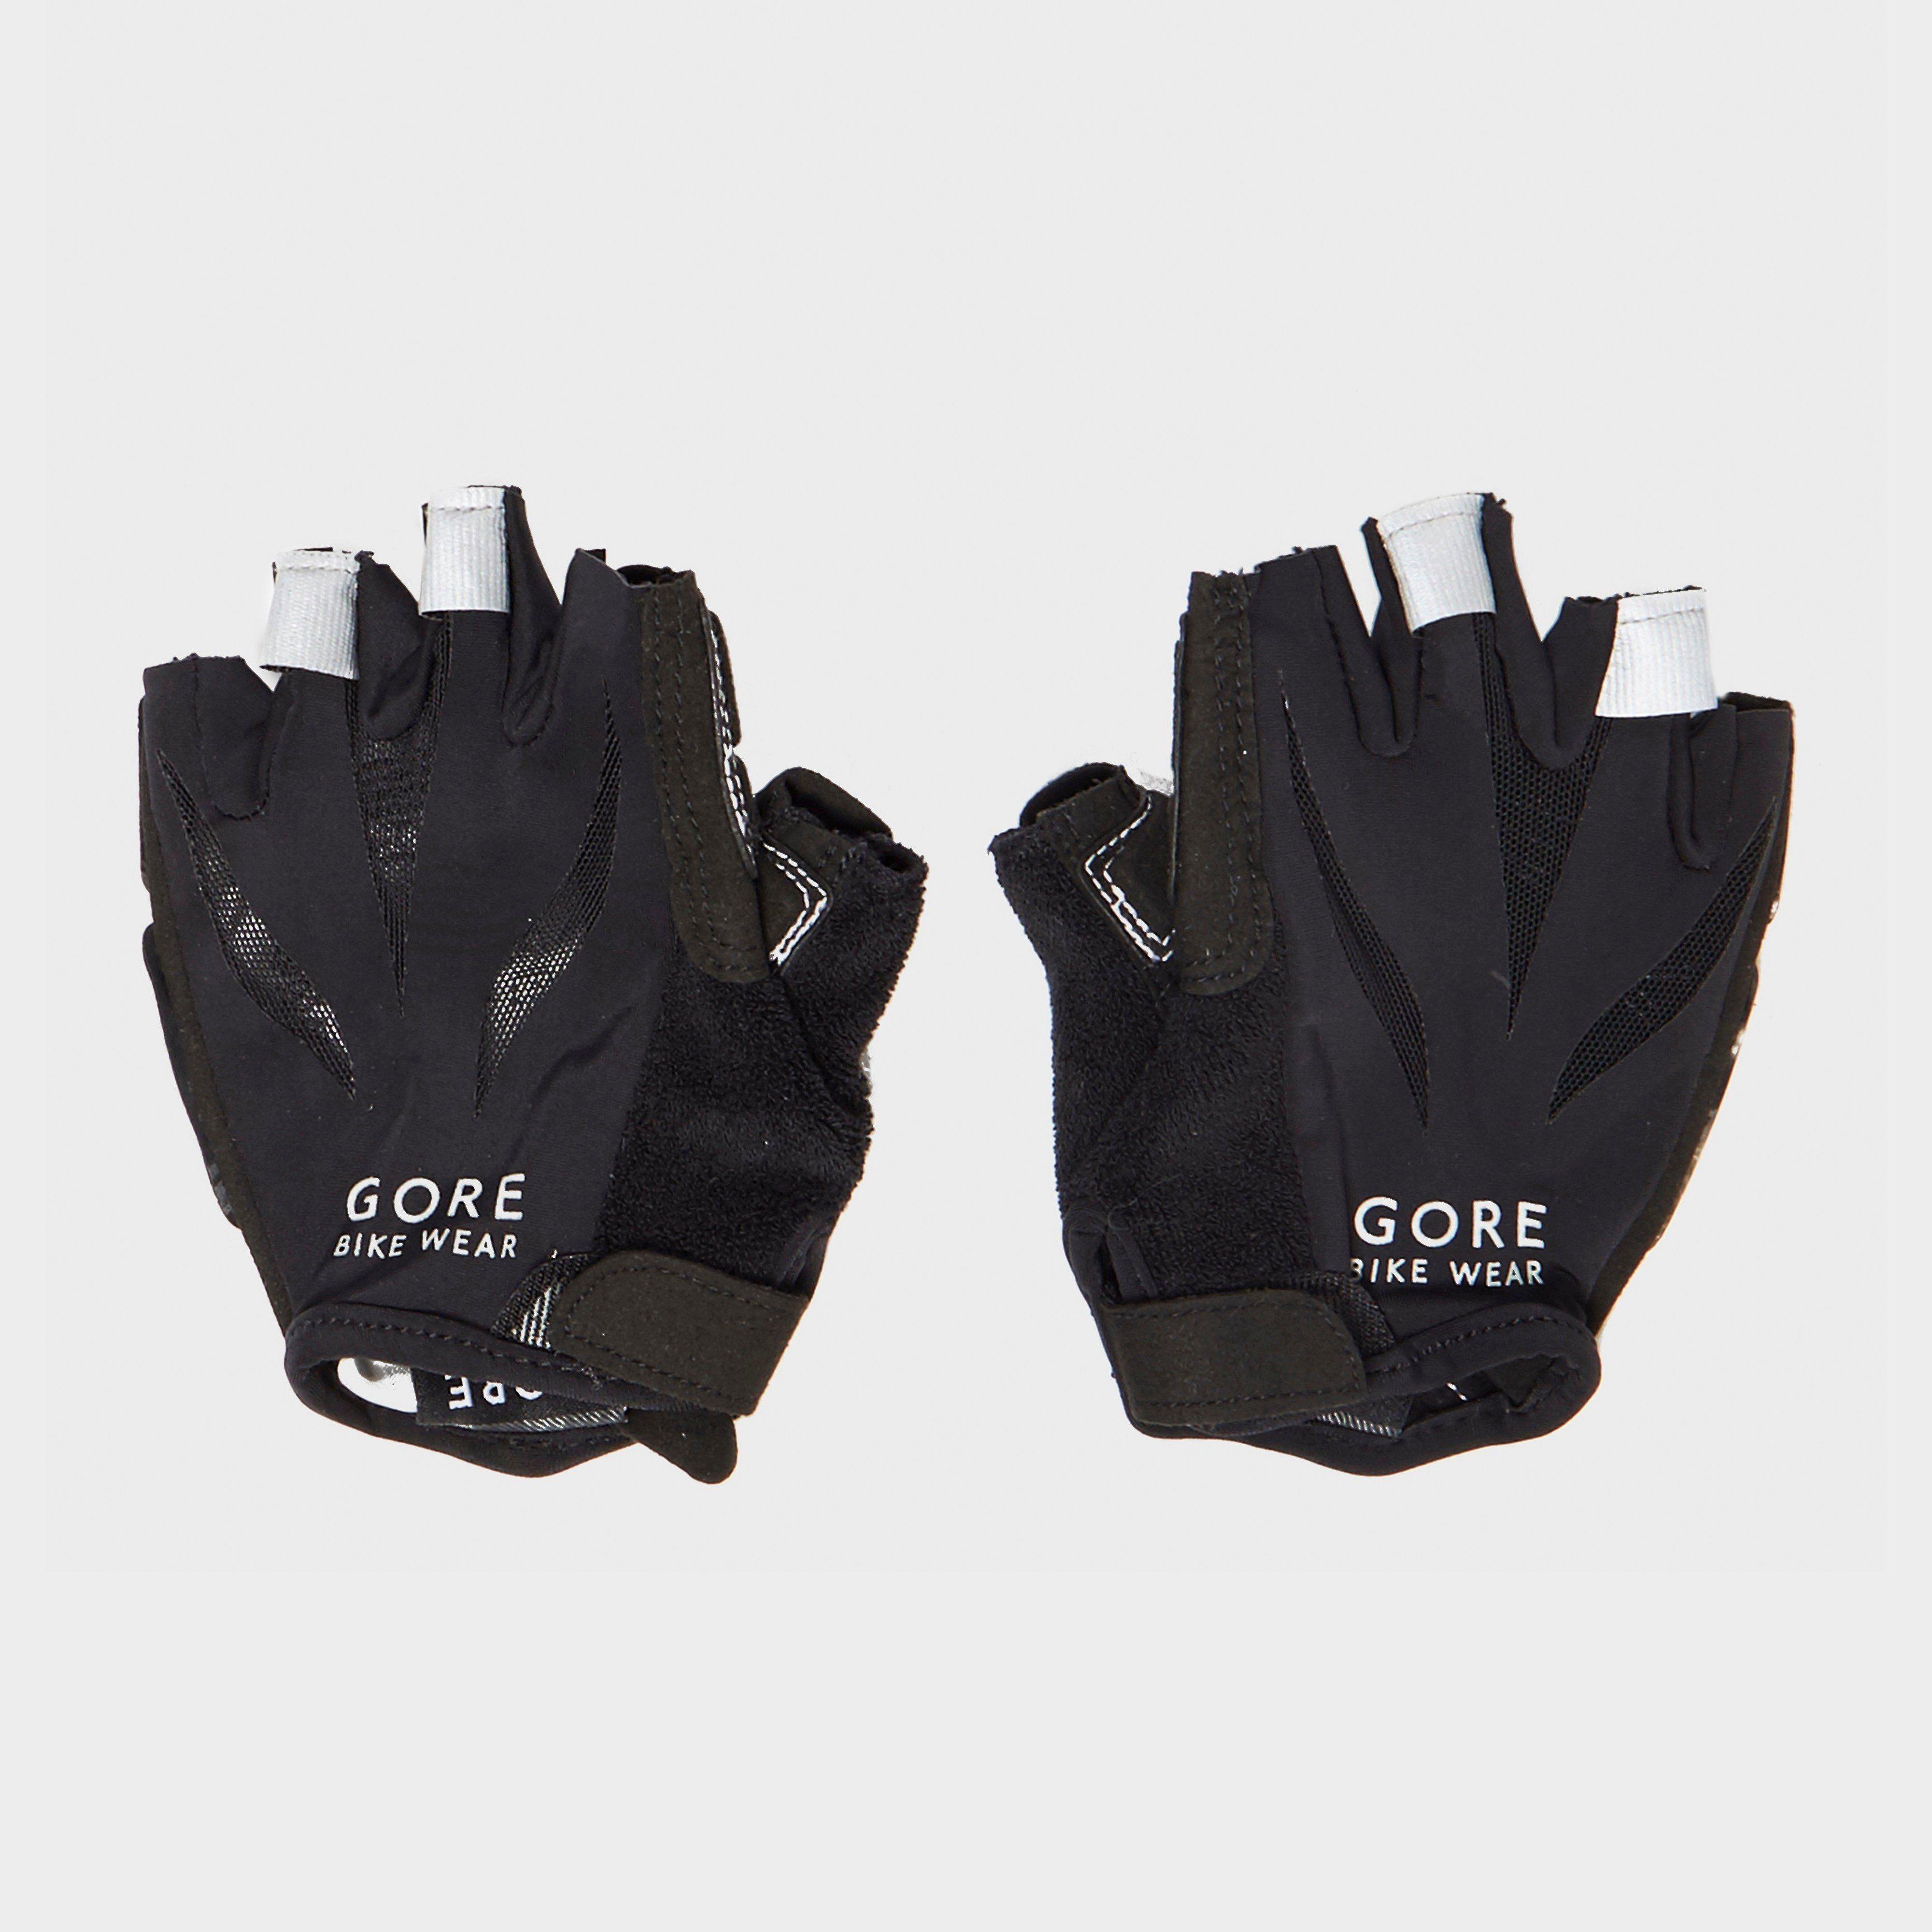 GORE Women's Countdown 2.0 Summer Lady Gloves